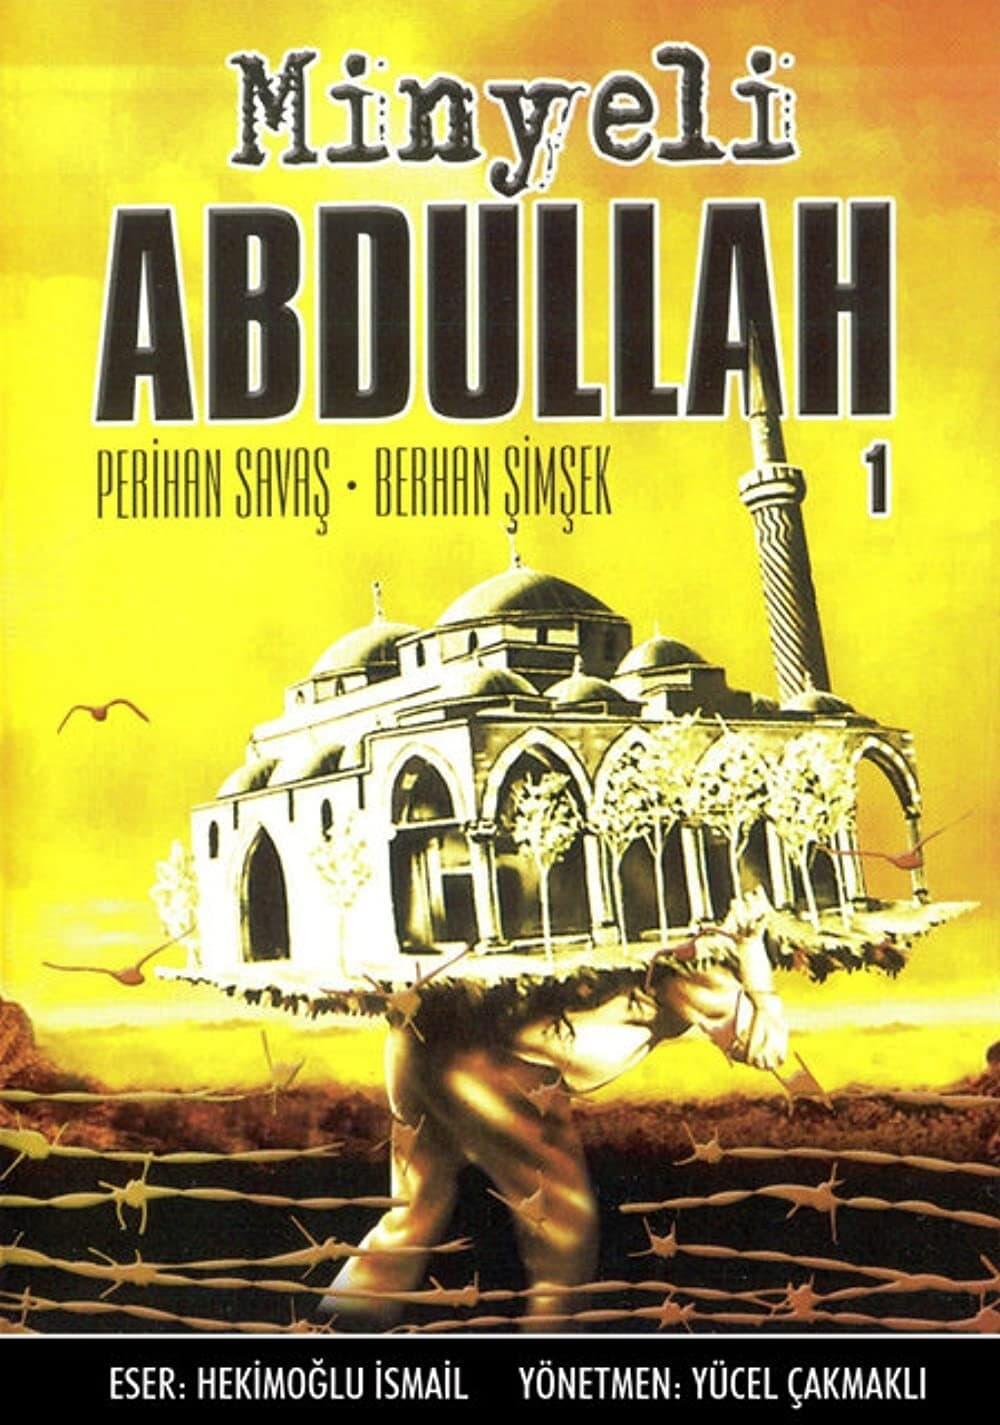 Abdullah from Minye